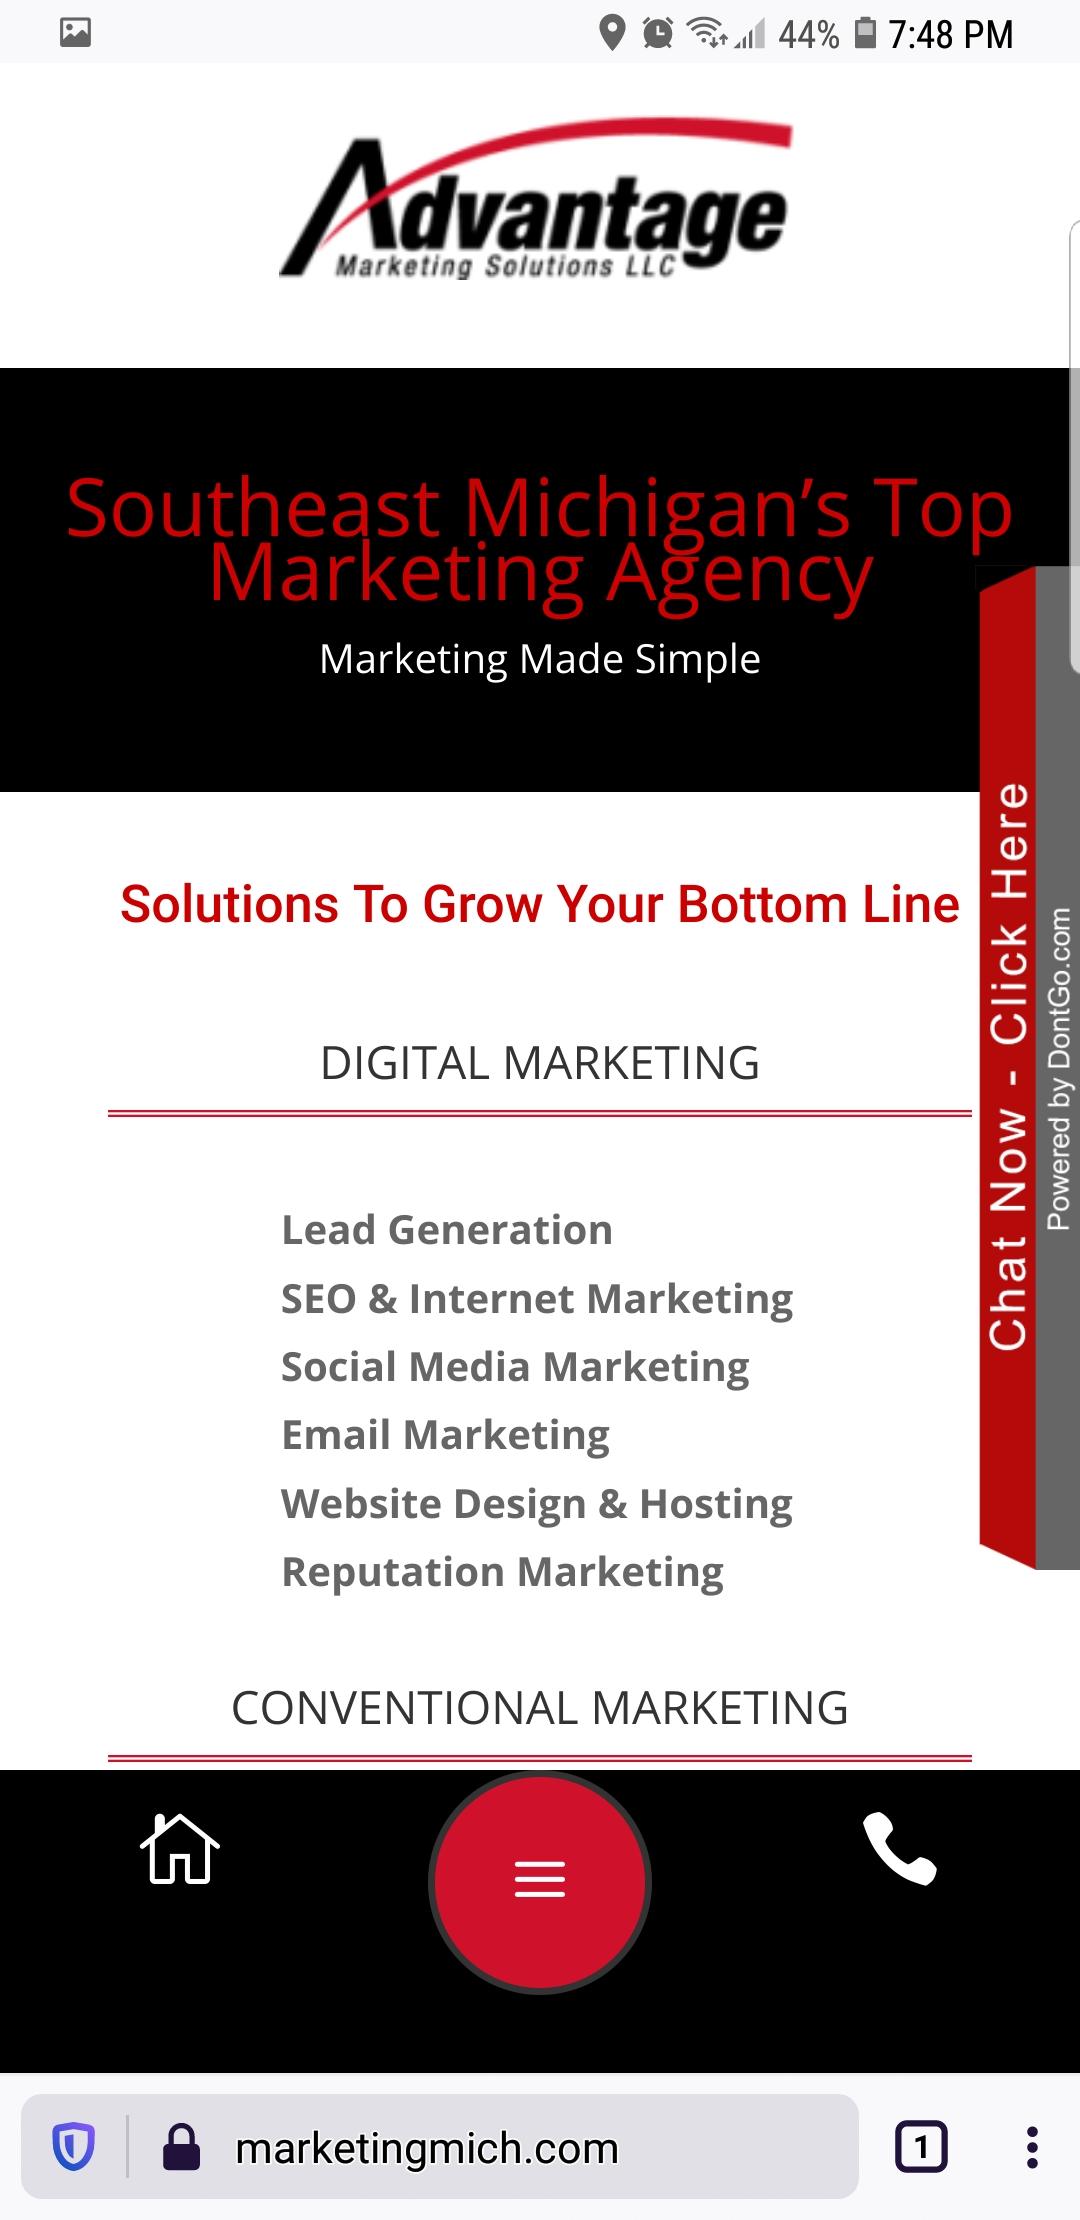 Advantage Marketing Solutions